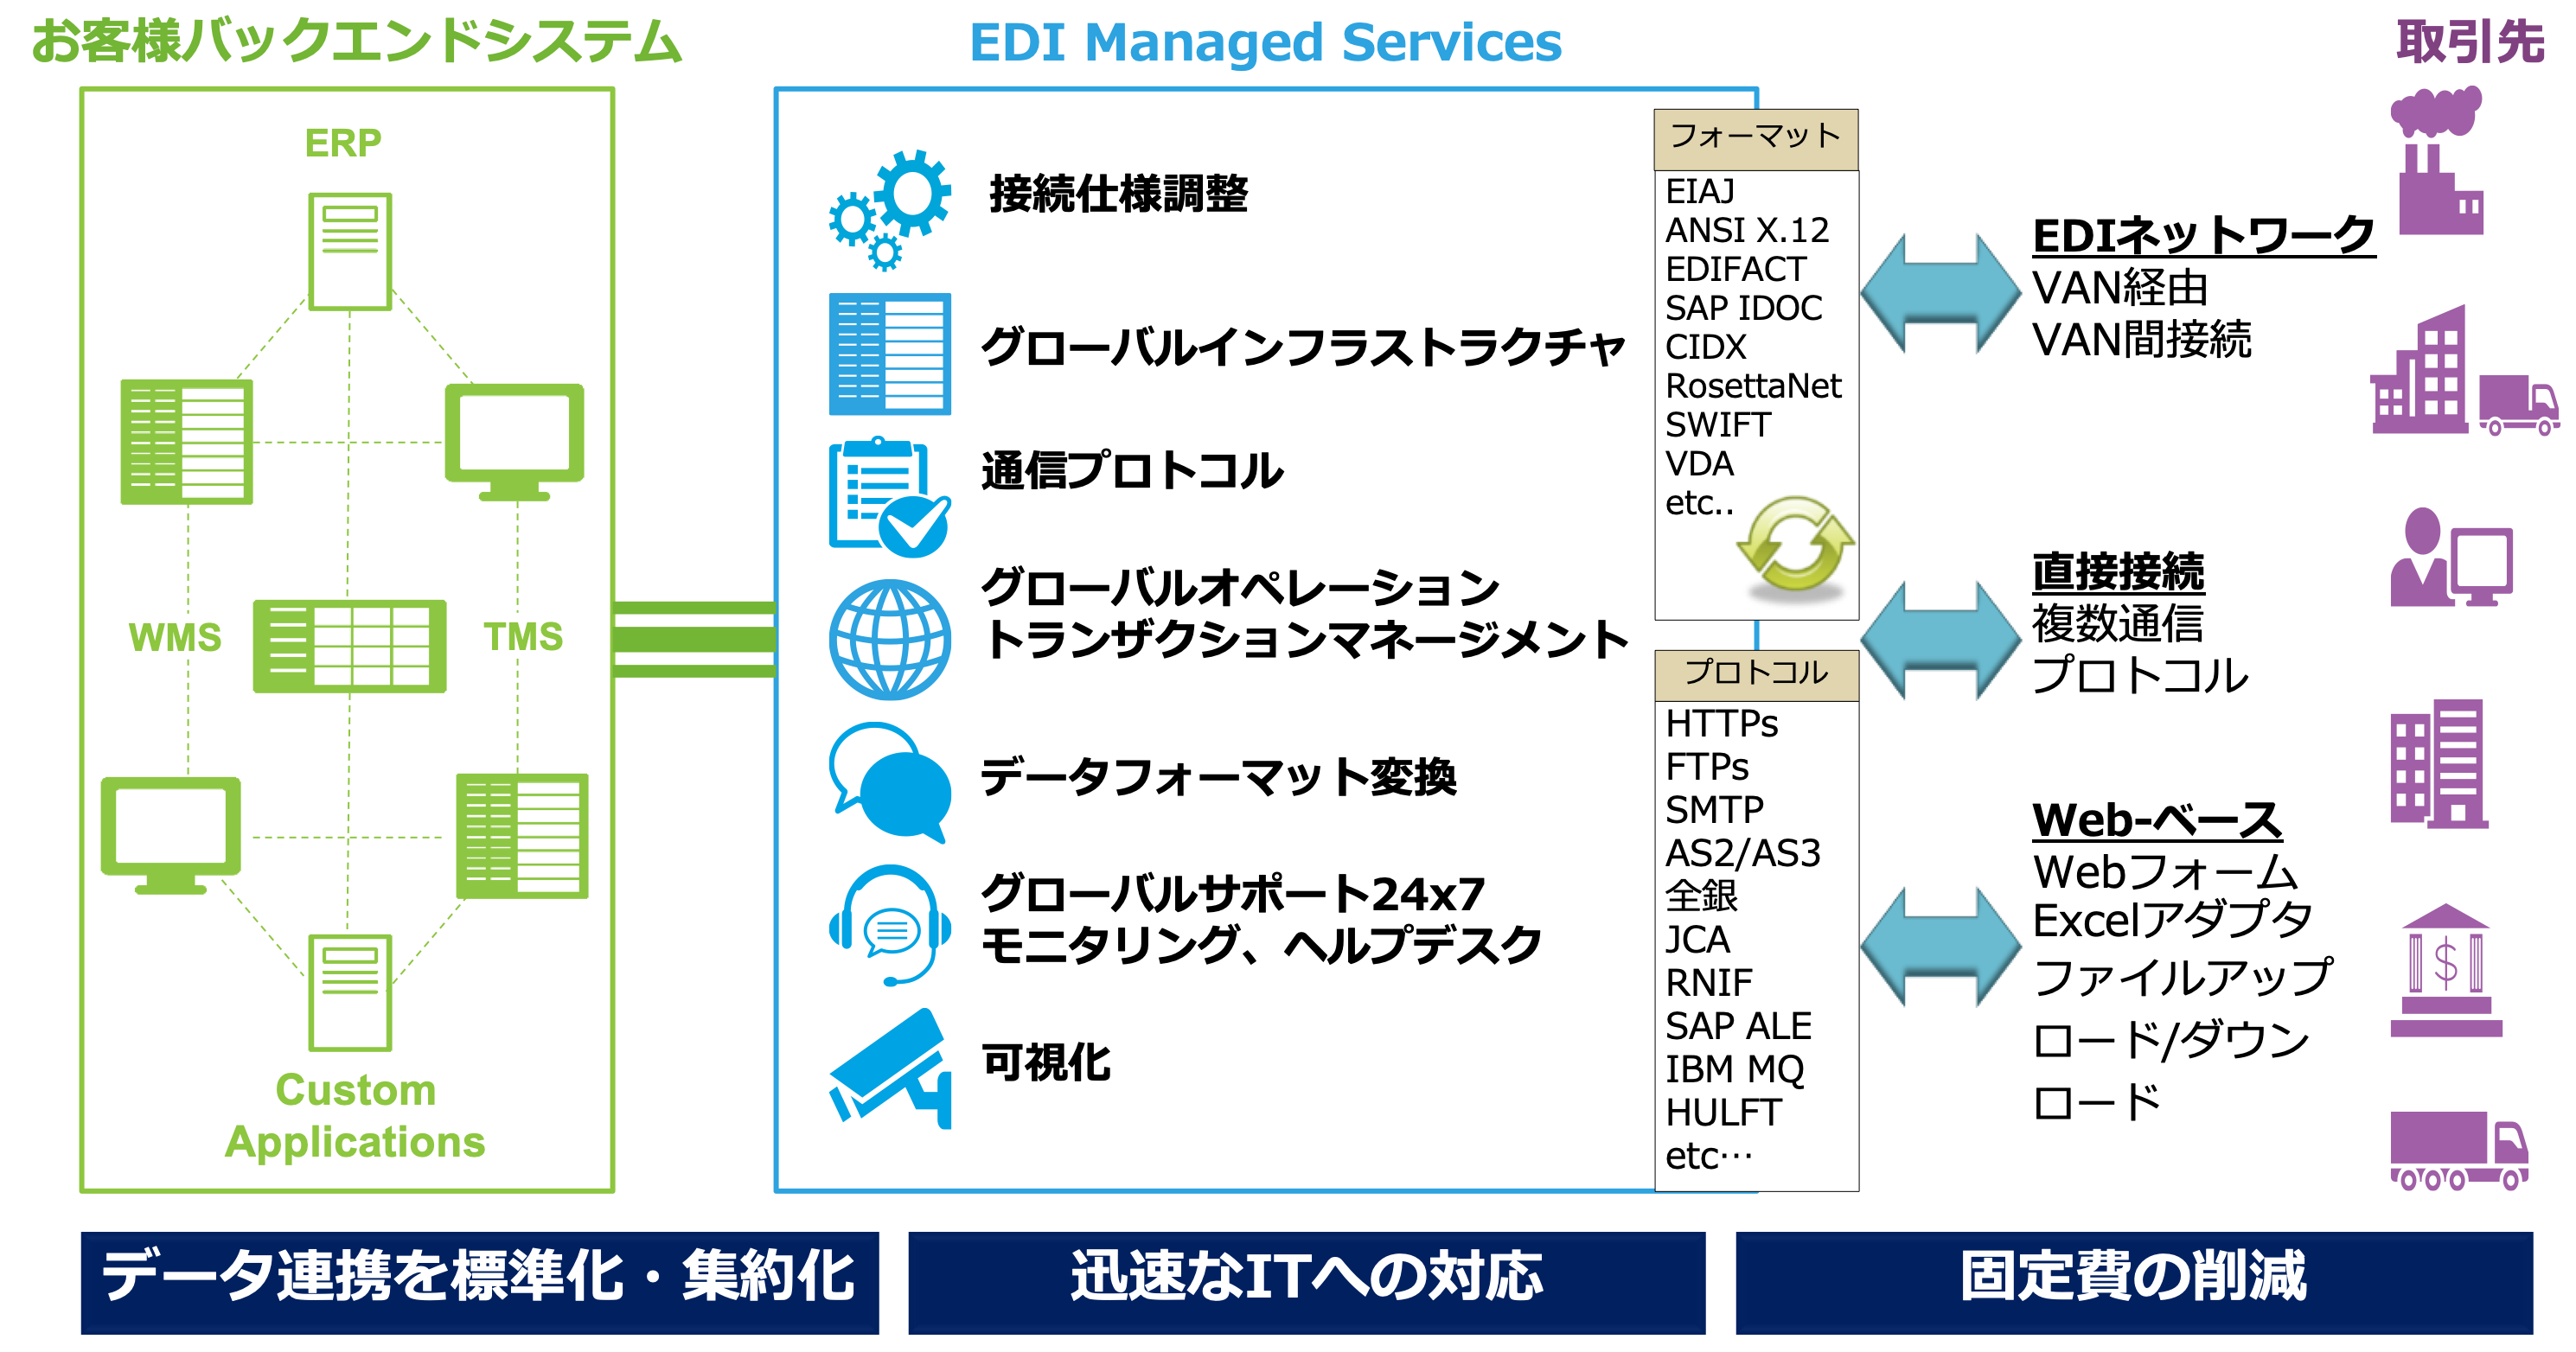 EDI-Managed-Service